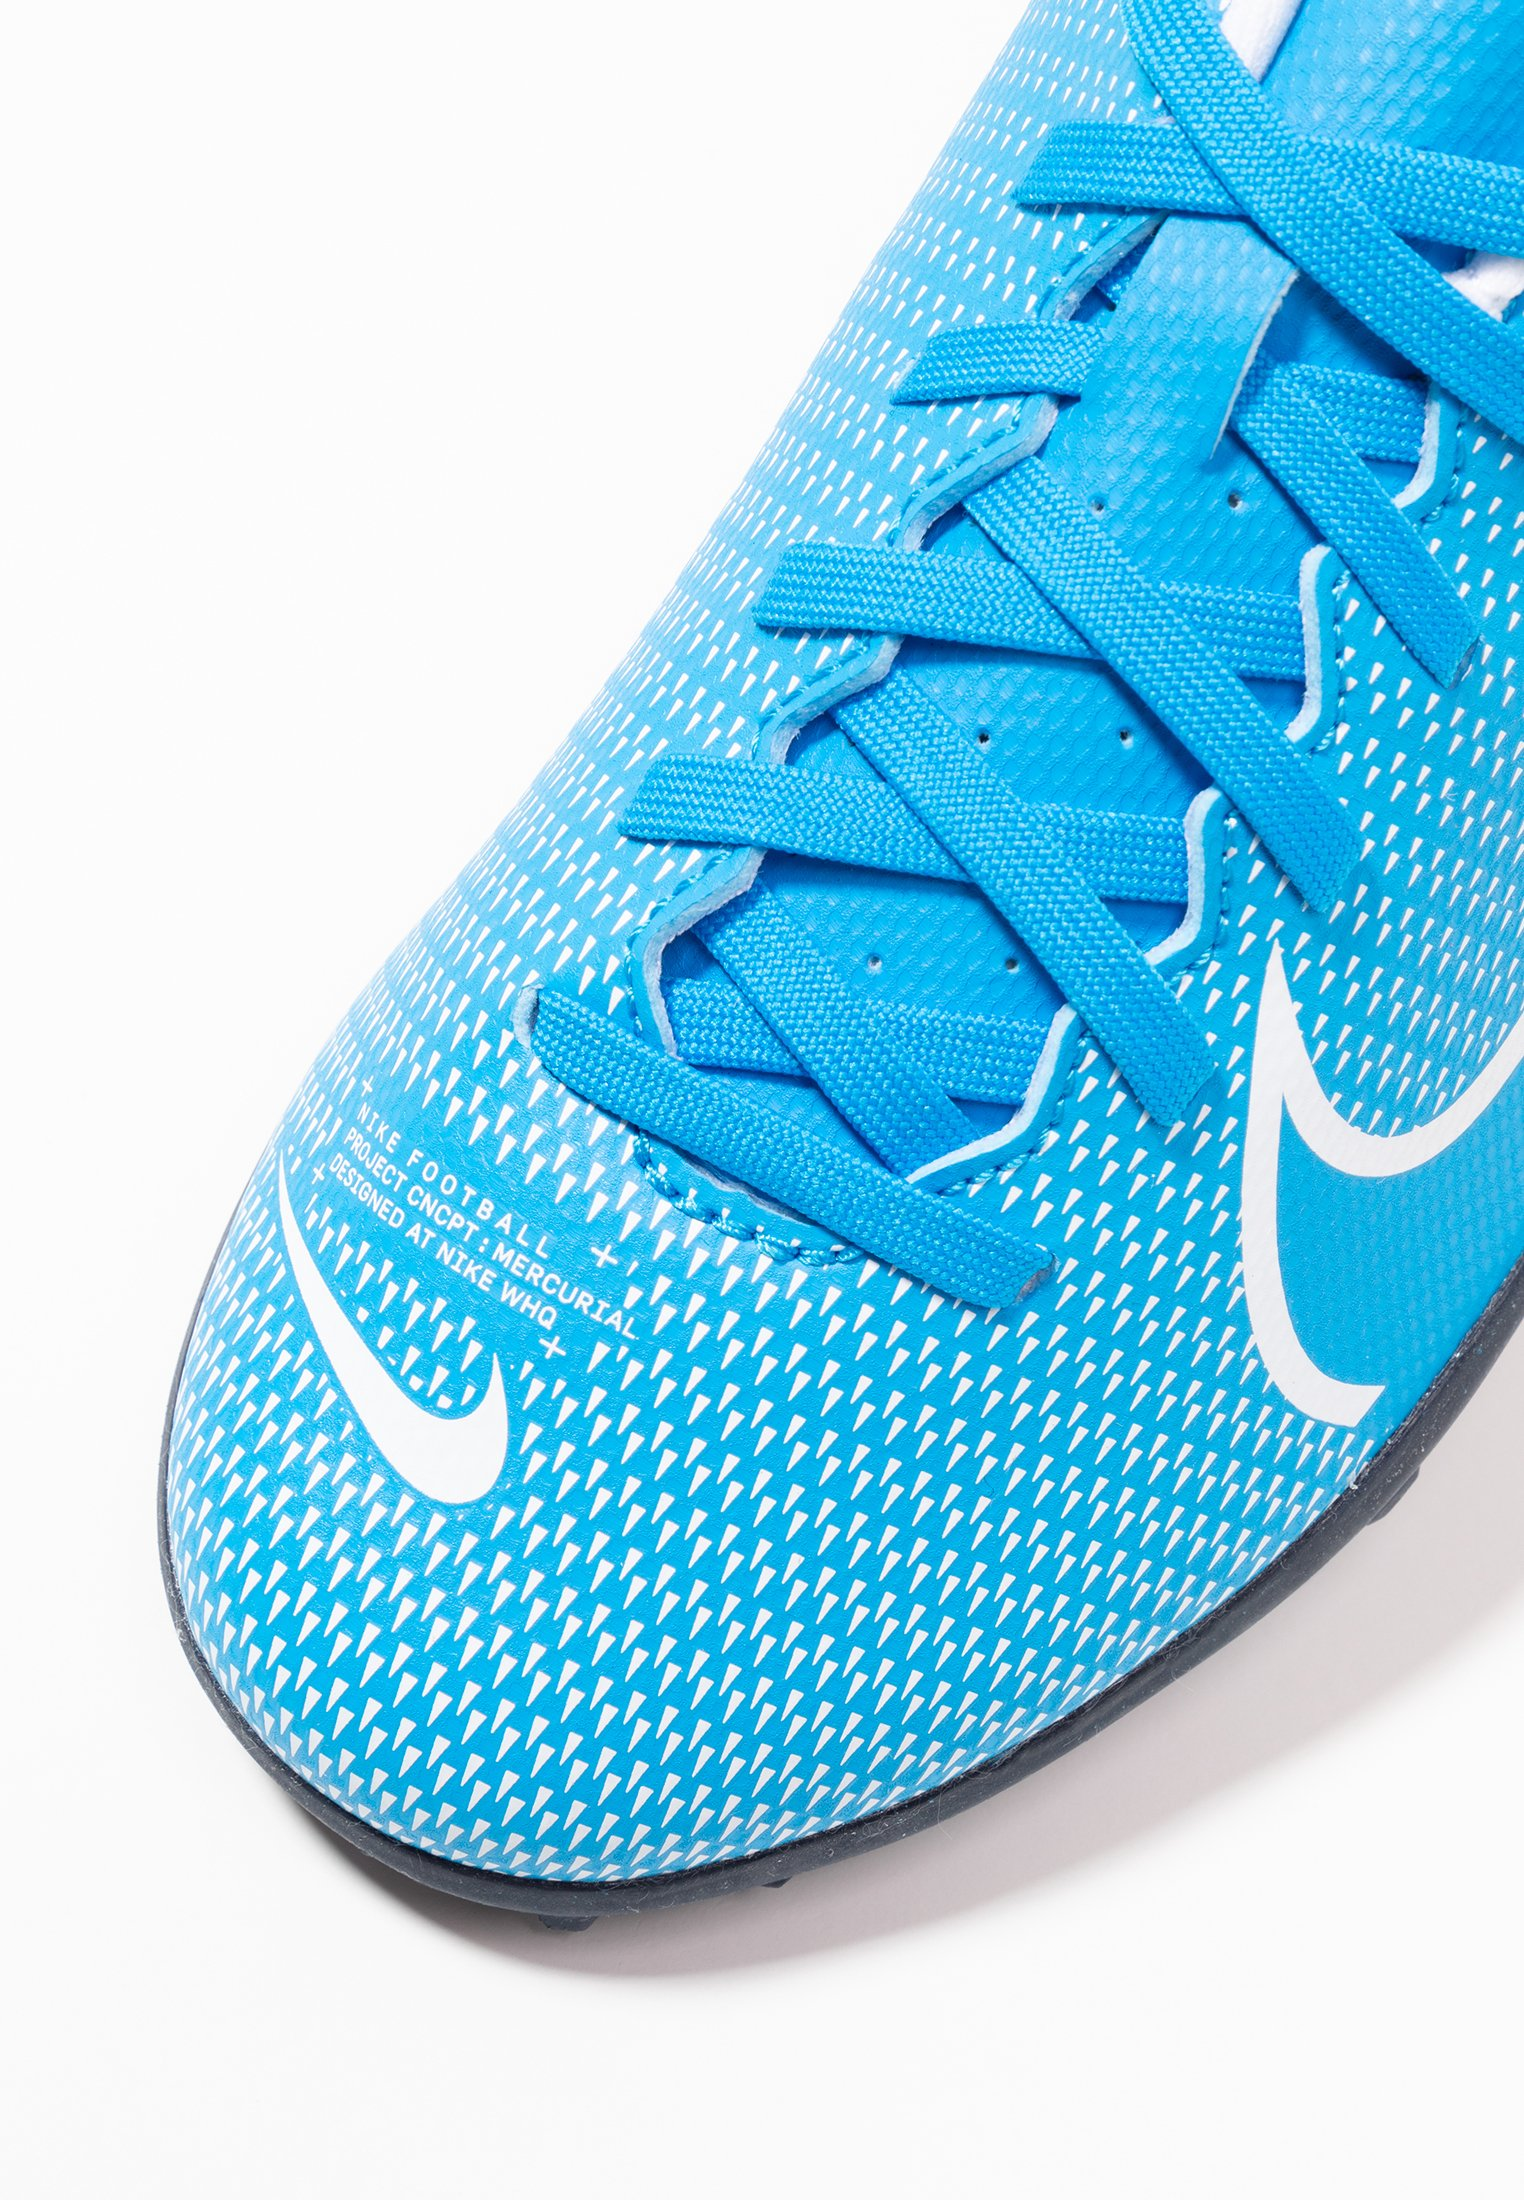 MERCURIAL VAPOR 13 CLUB TF Chaussures de foot multicrampons blue herowhiteobsidian